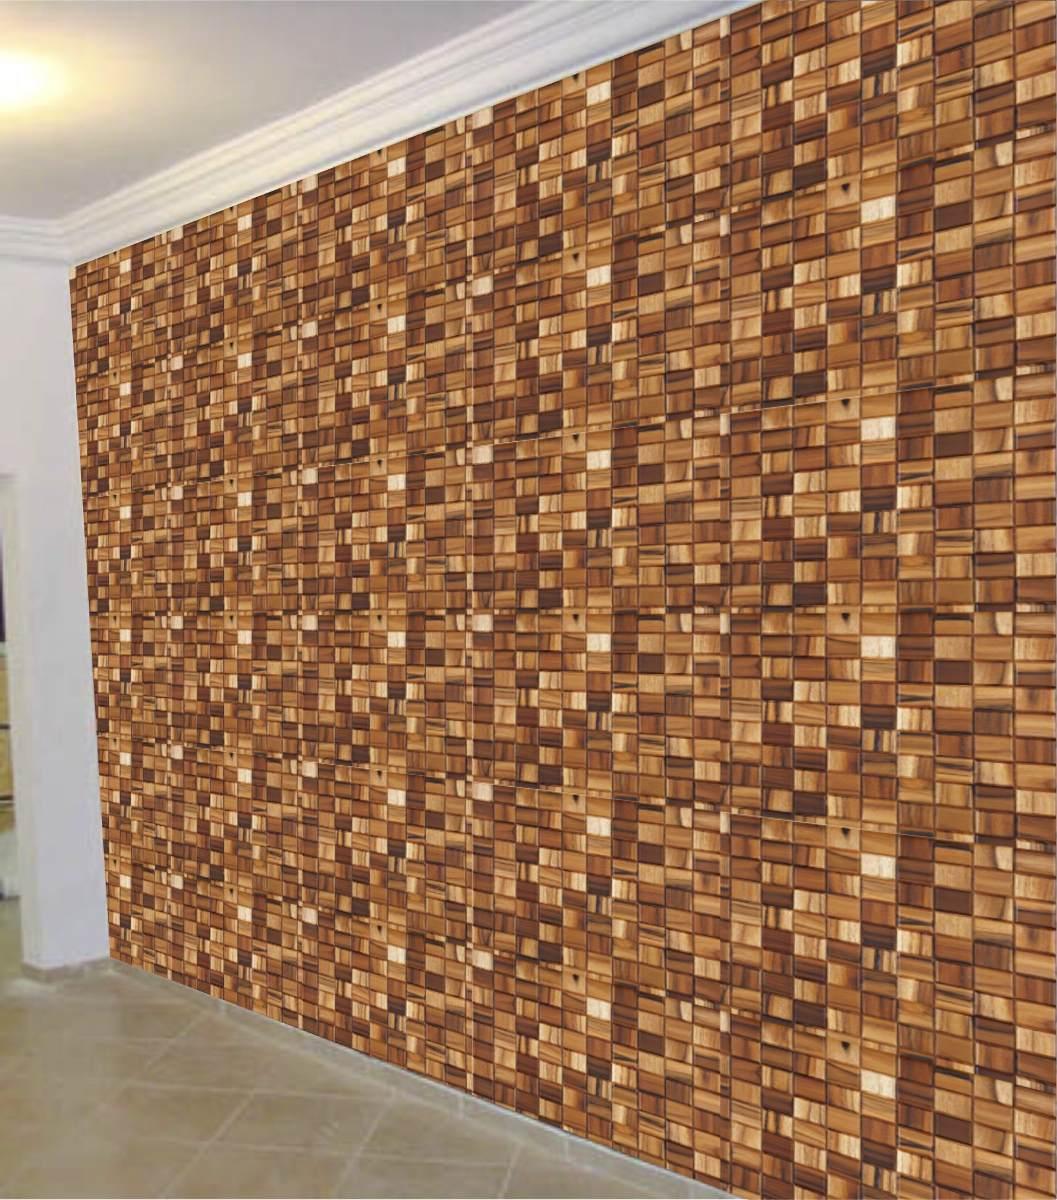 Adesivo De Parede Textura Fosca Madeira Decorativo 50cm 3 M R 42  -> Papel De Parede Para Sala Amadeirado